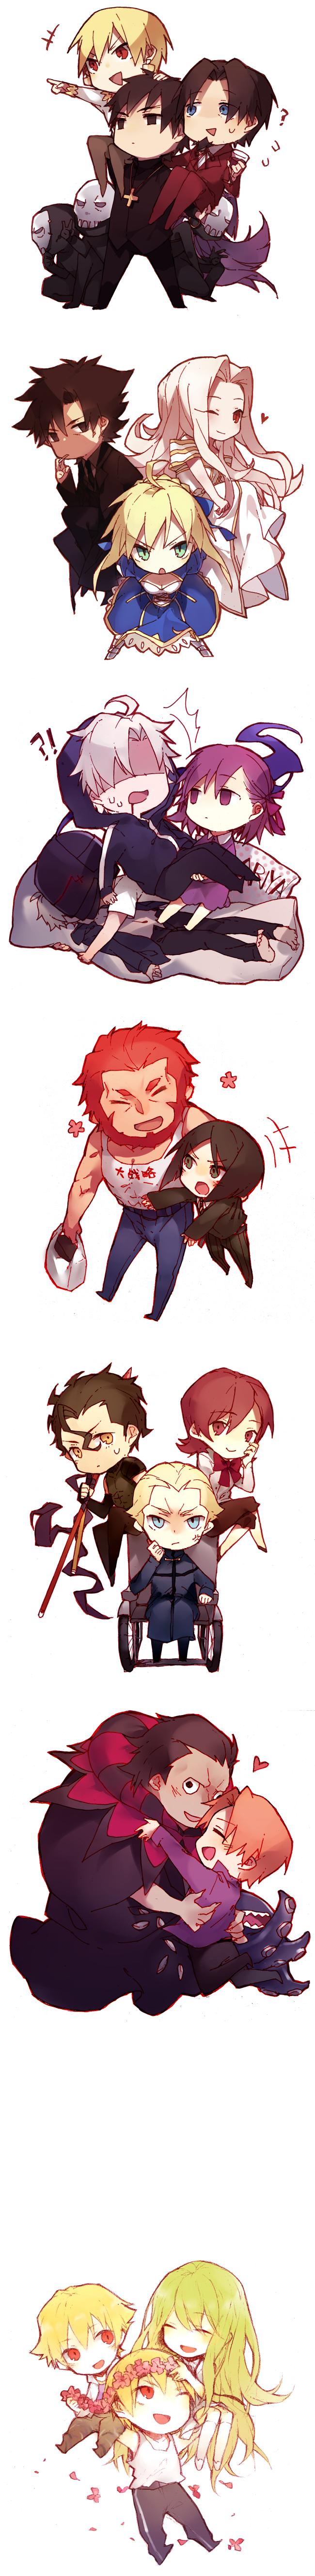 Tags: Anime, Mayer, Fate/strange fake, Fate/zero, Fate/hollow ataraxia, Irisviel von Einzbern, Berserker (Fate/zero), Saber (Fate/stay night), Tohsaka Tokiomi, Uryuu Ryuunosuke, Gilgamesh, Assassin (Fate/zero), Matou Kariya